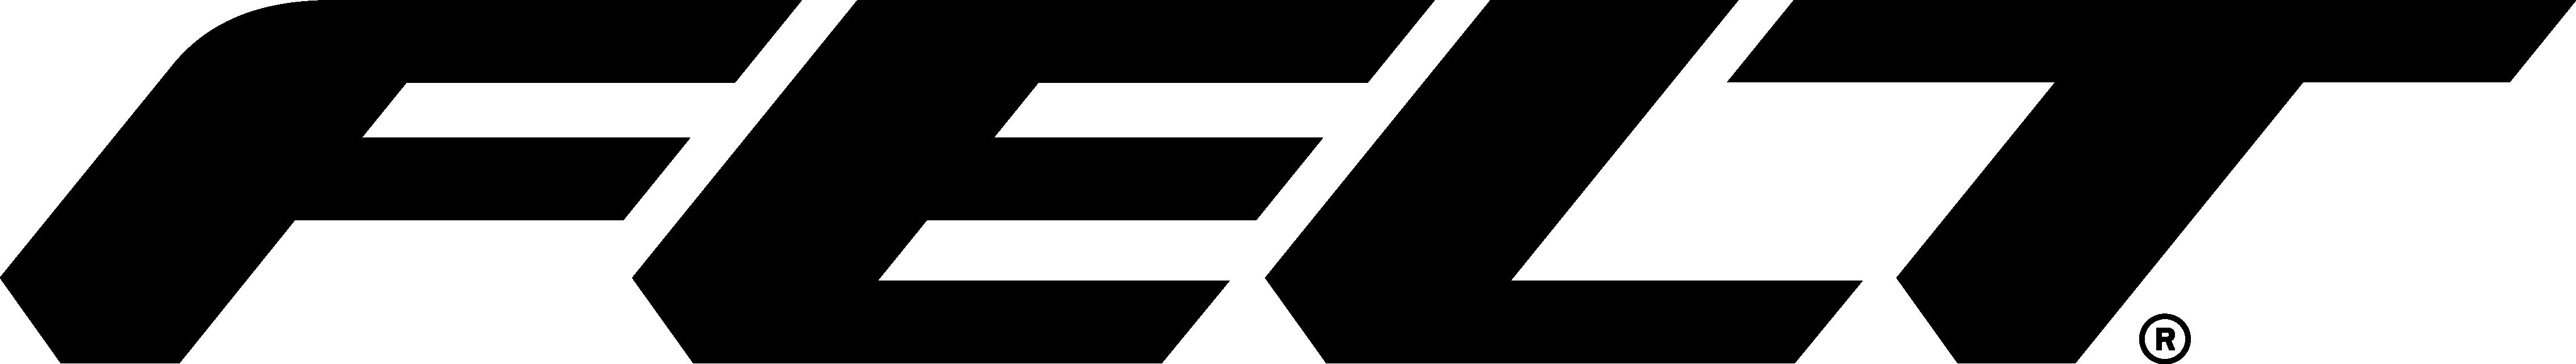 2016-logo-blk.png